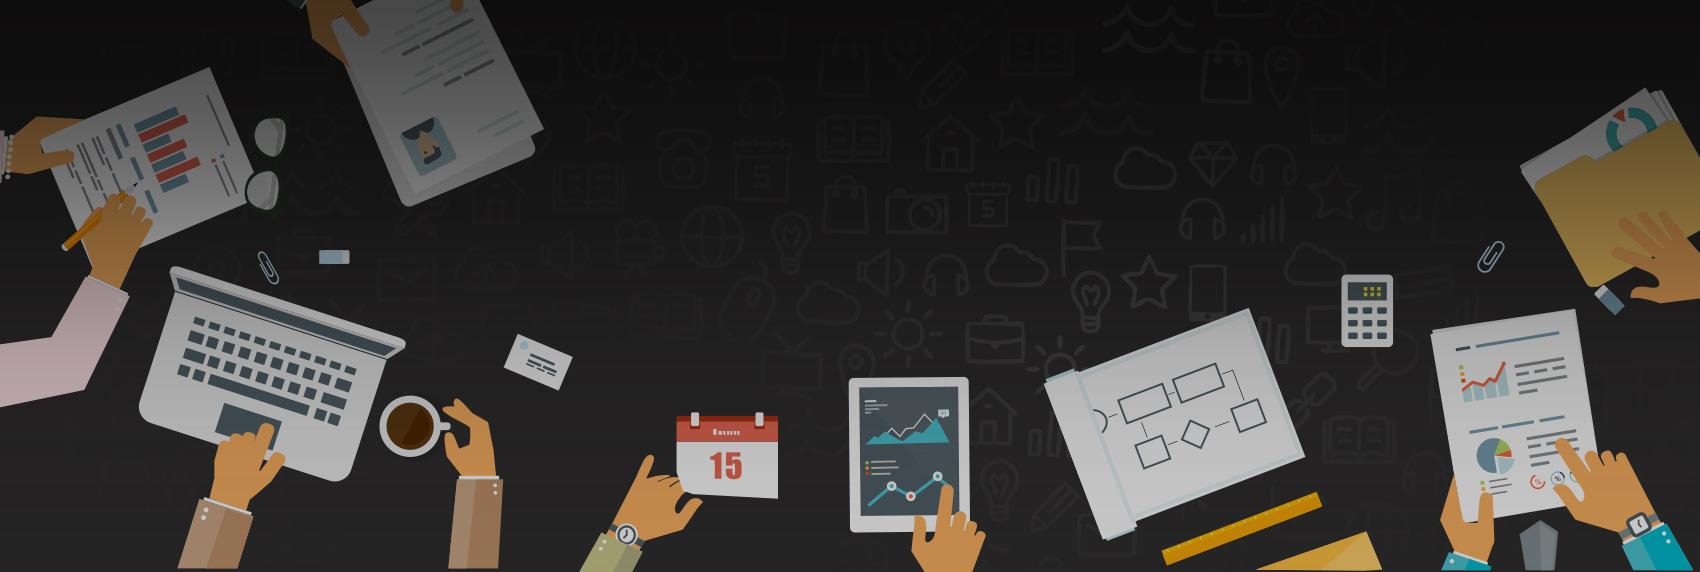 Professional PowerPoint Templates and Keynote Slides - Slidebazaar